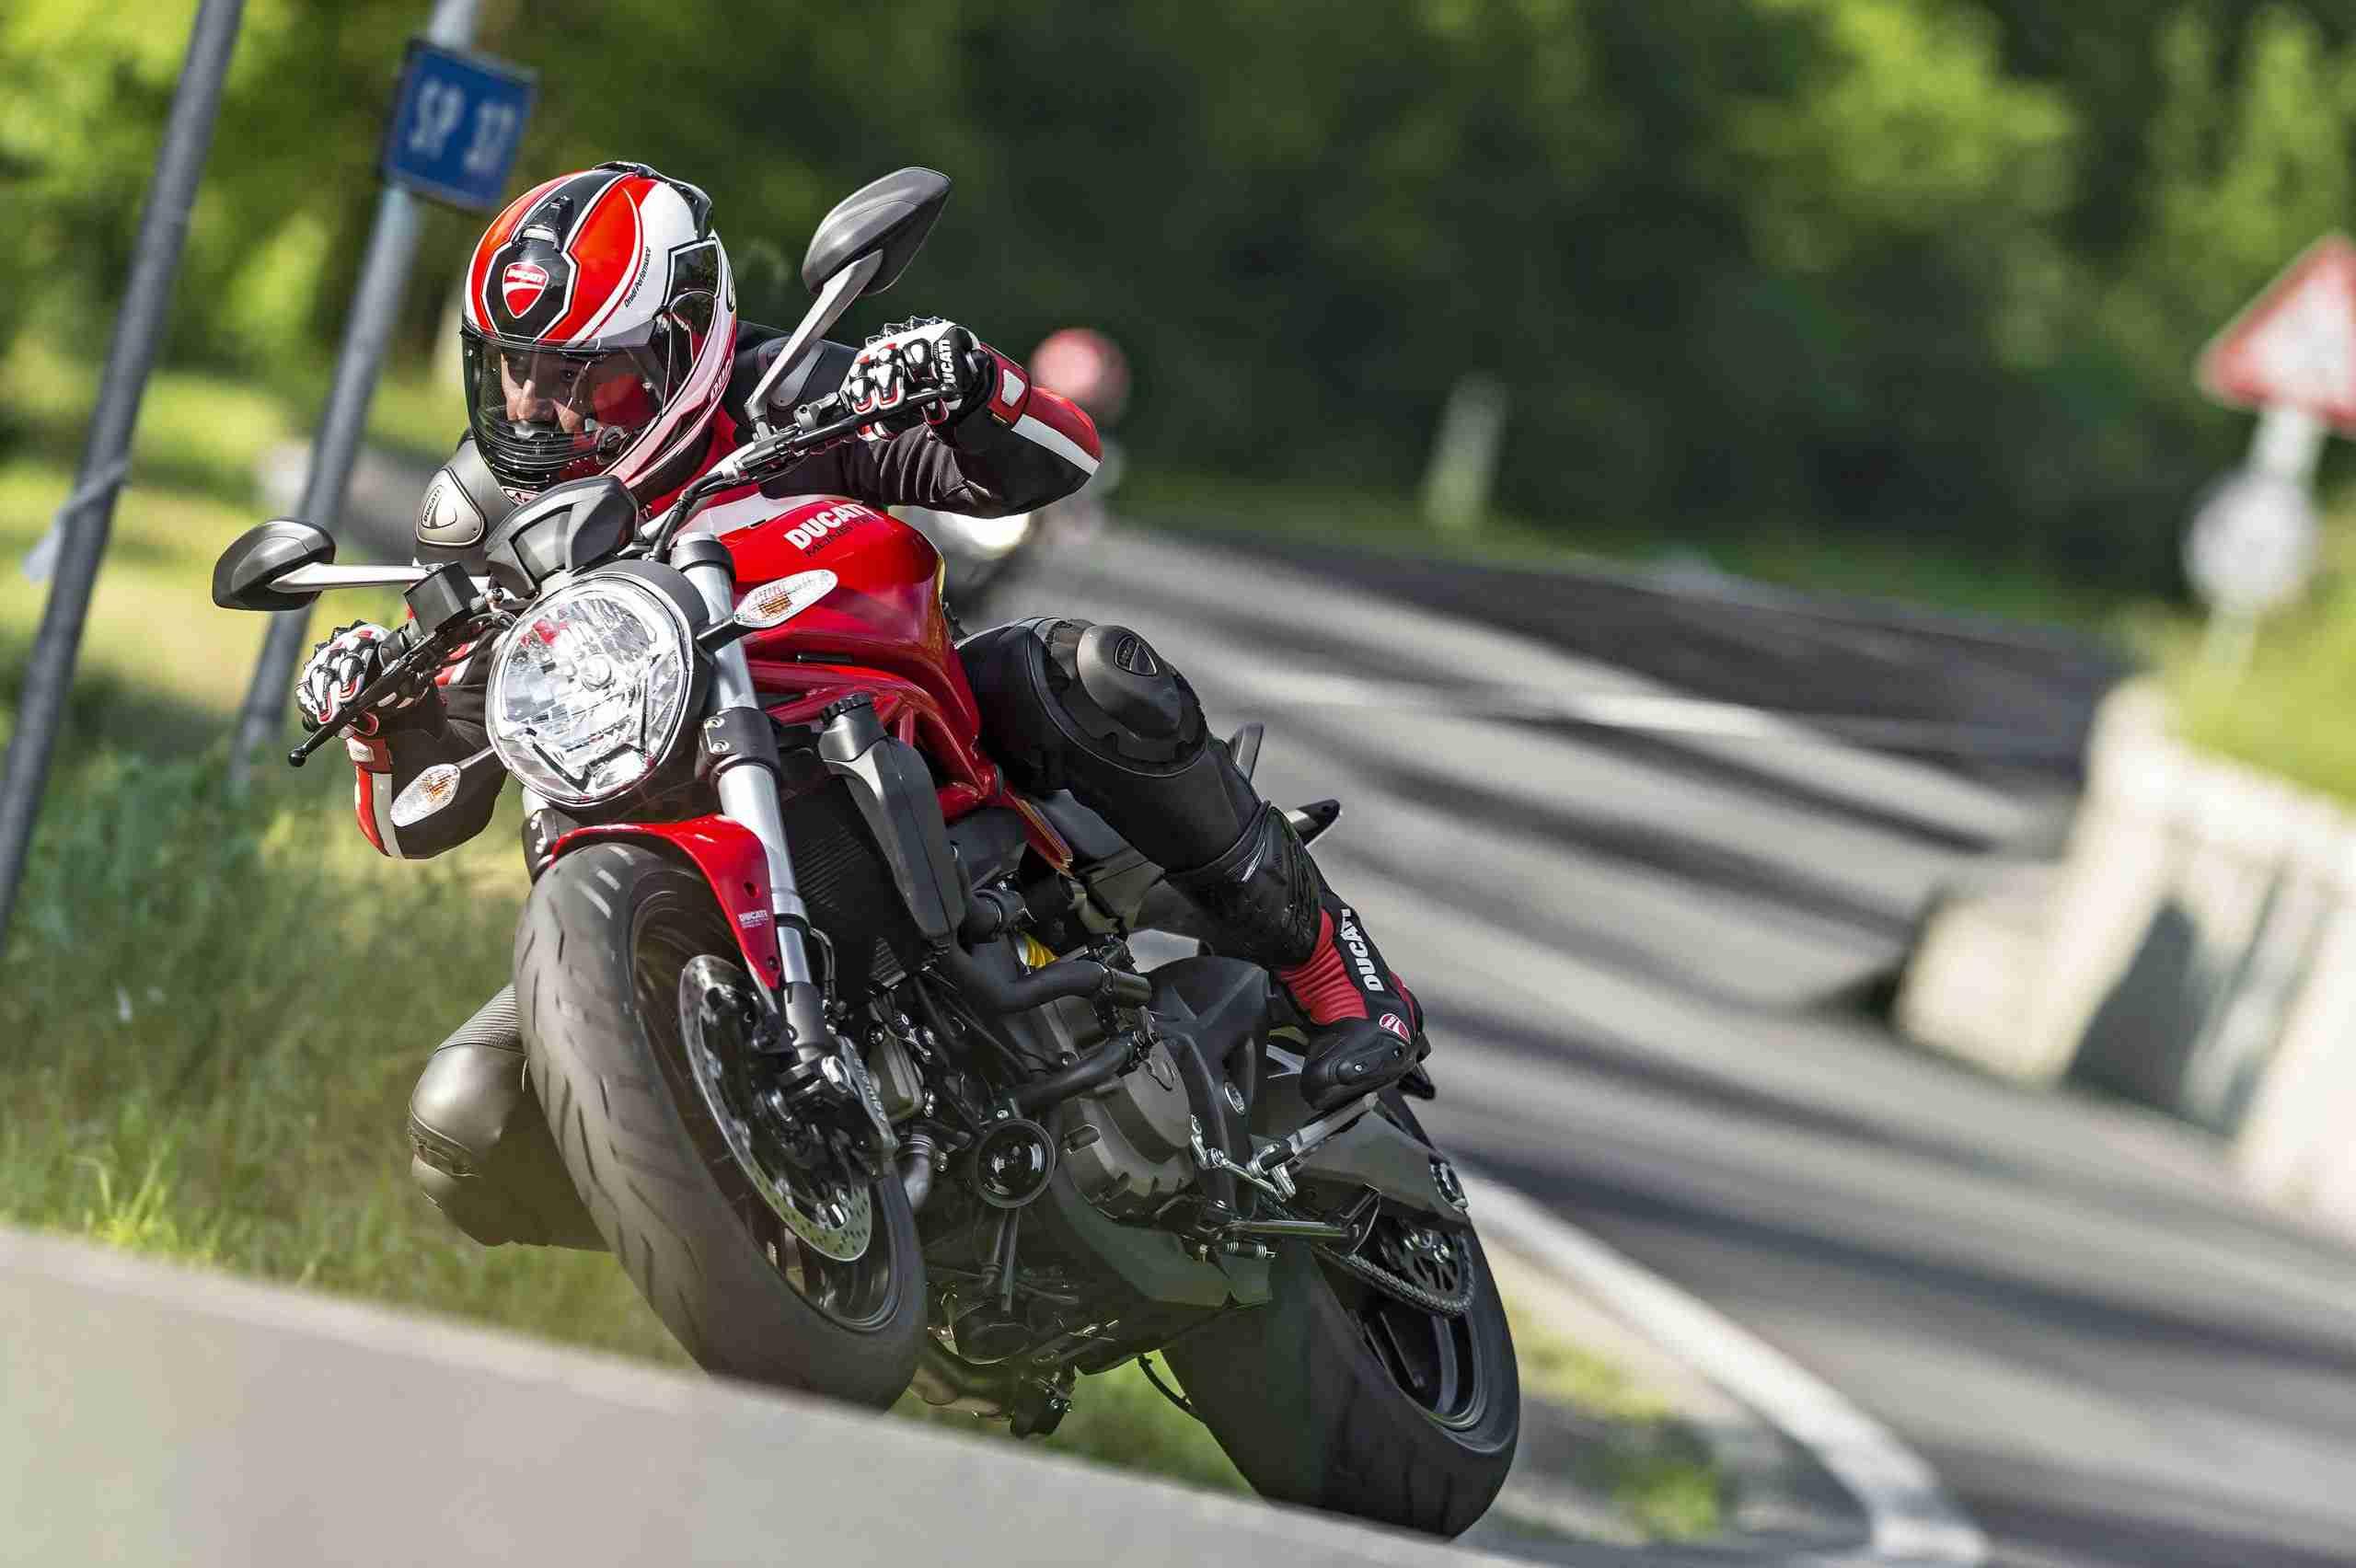 Ducati Monster 821 India